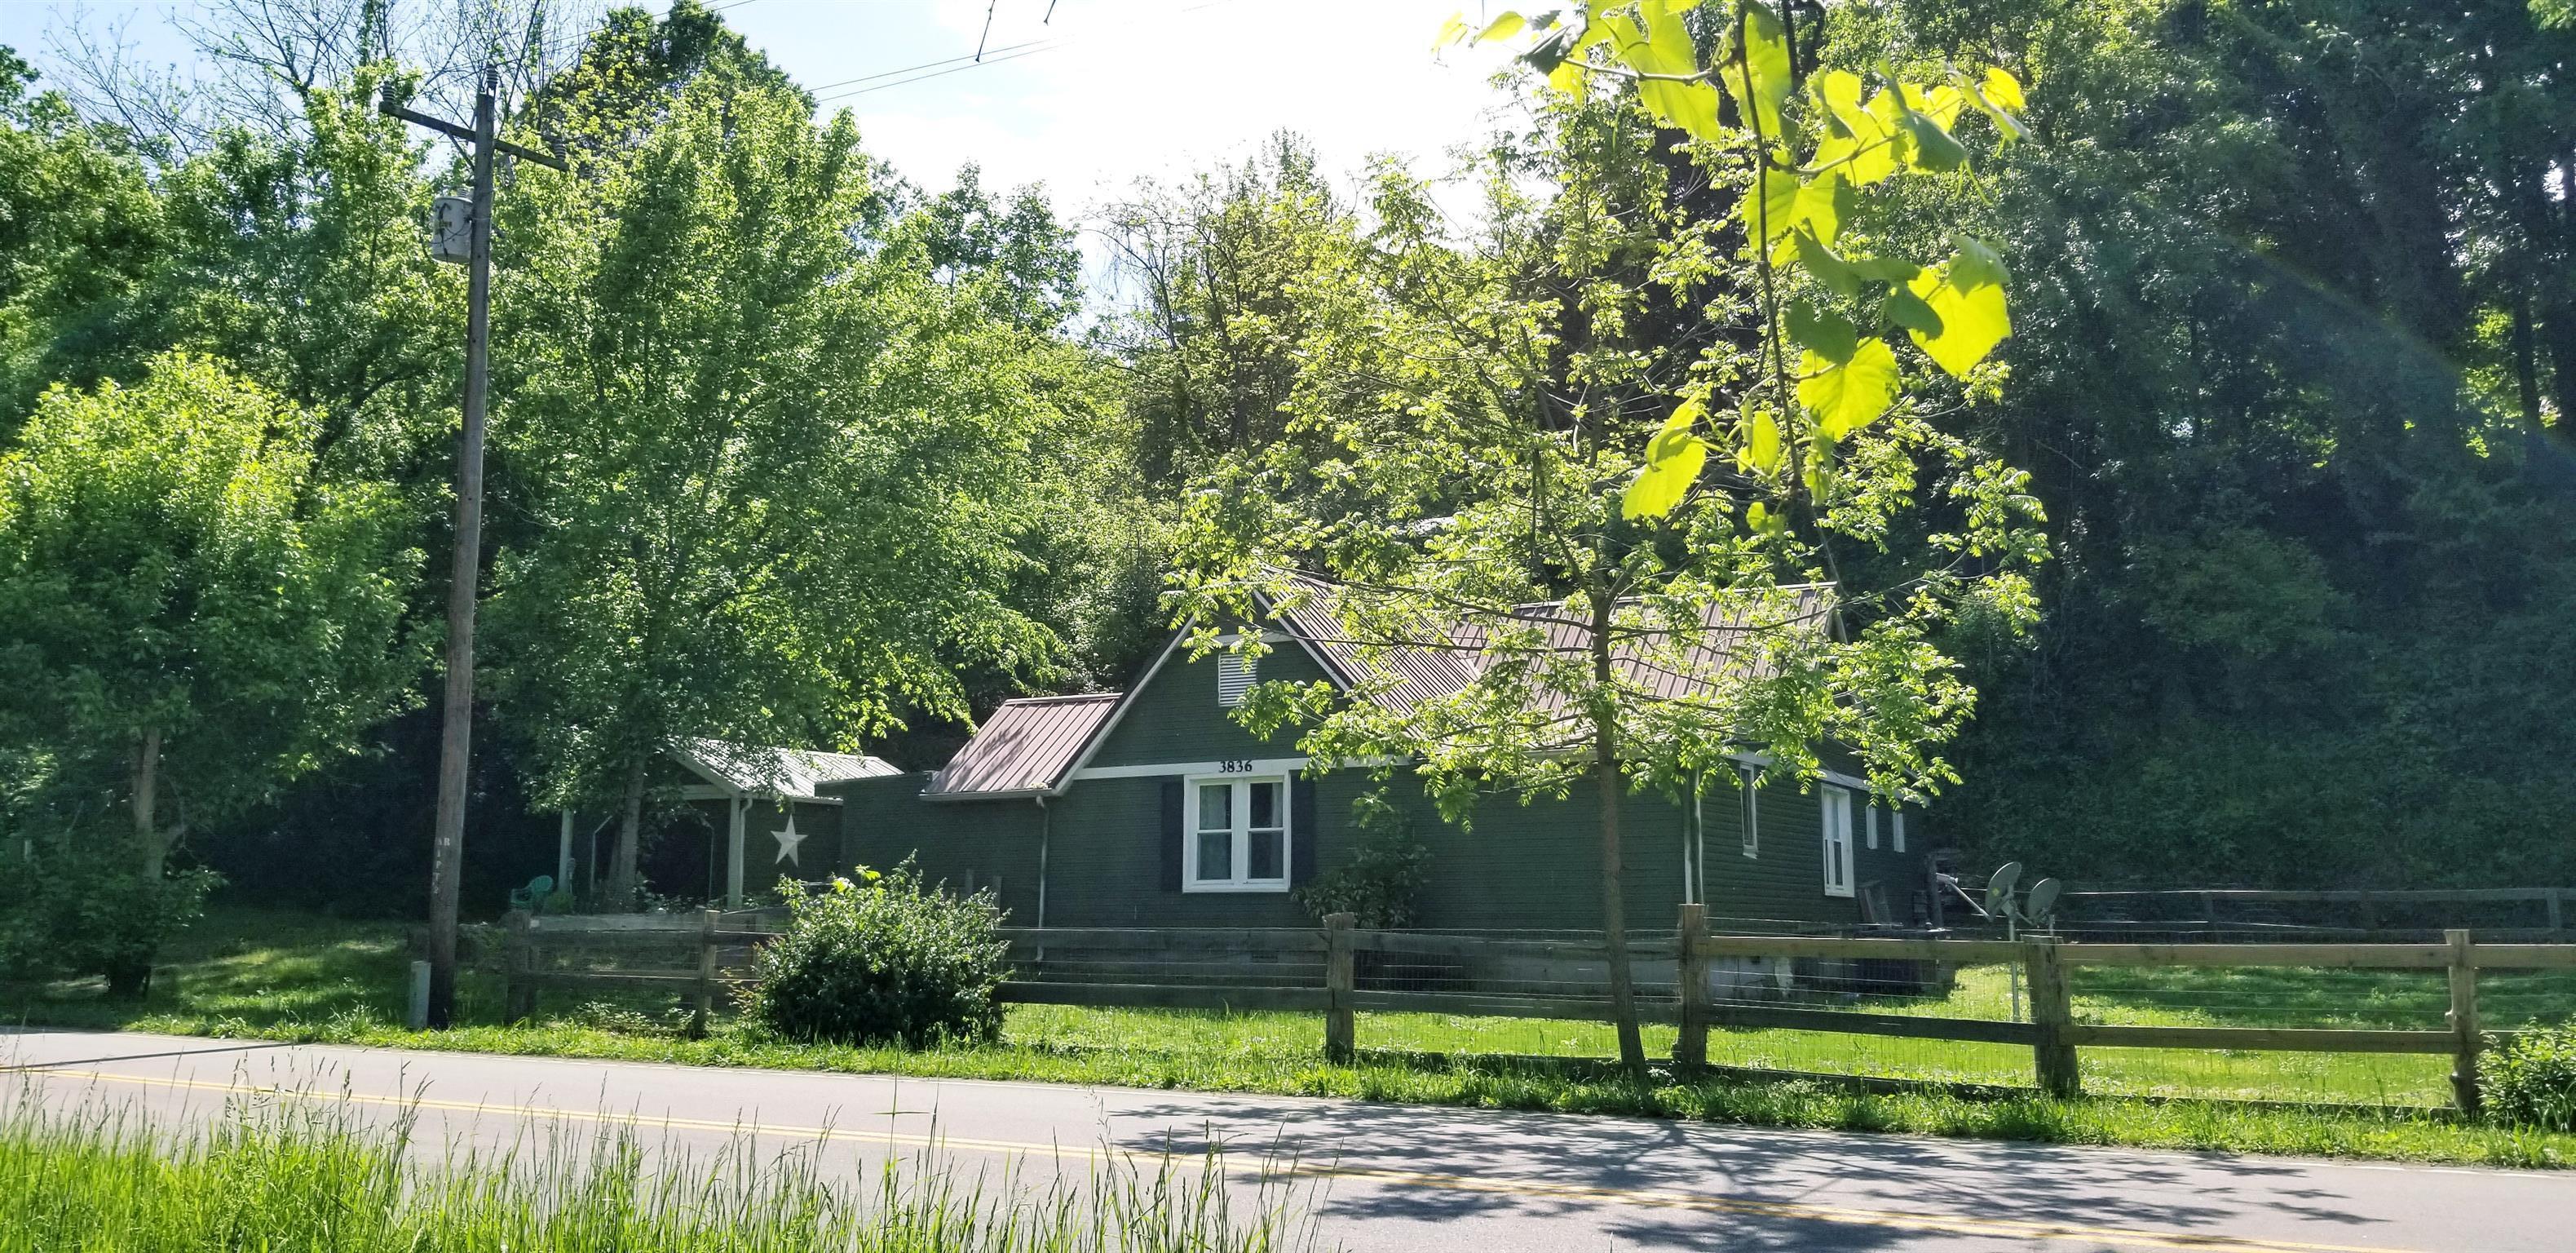 3836 Hwy 49, Tennessee Ridge, TN 37178 - Tennessee Ridge, TN real estate listing